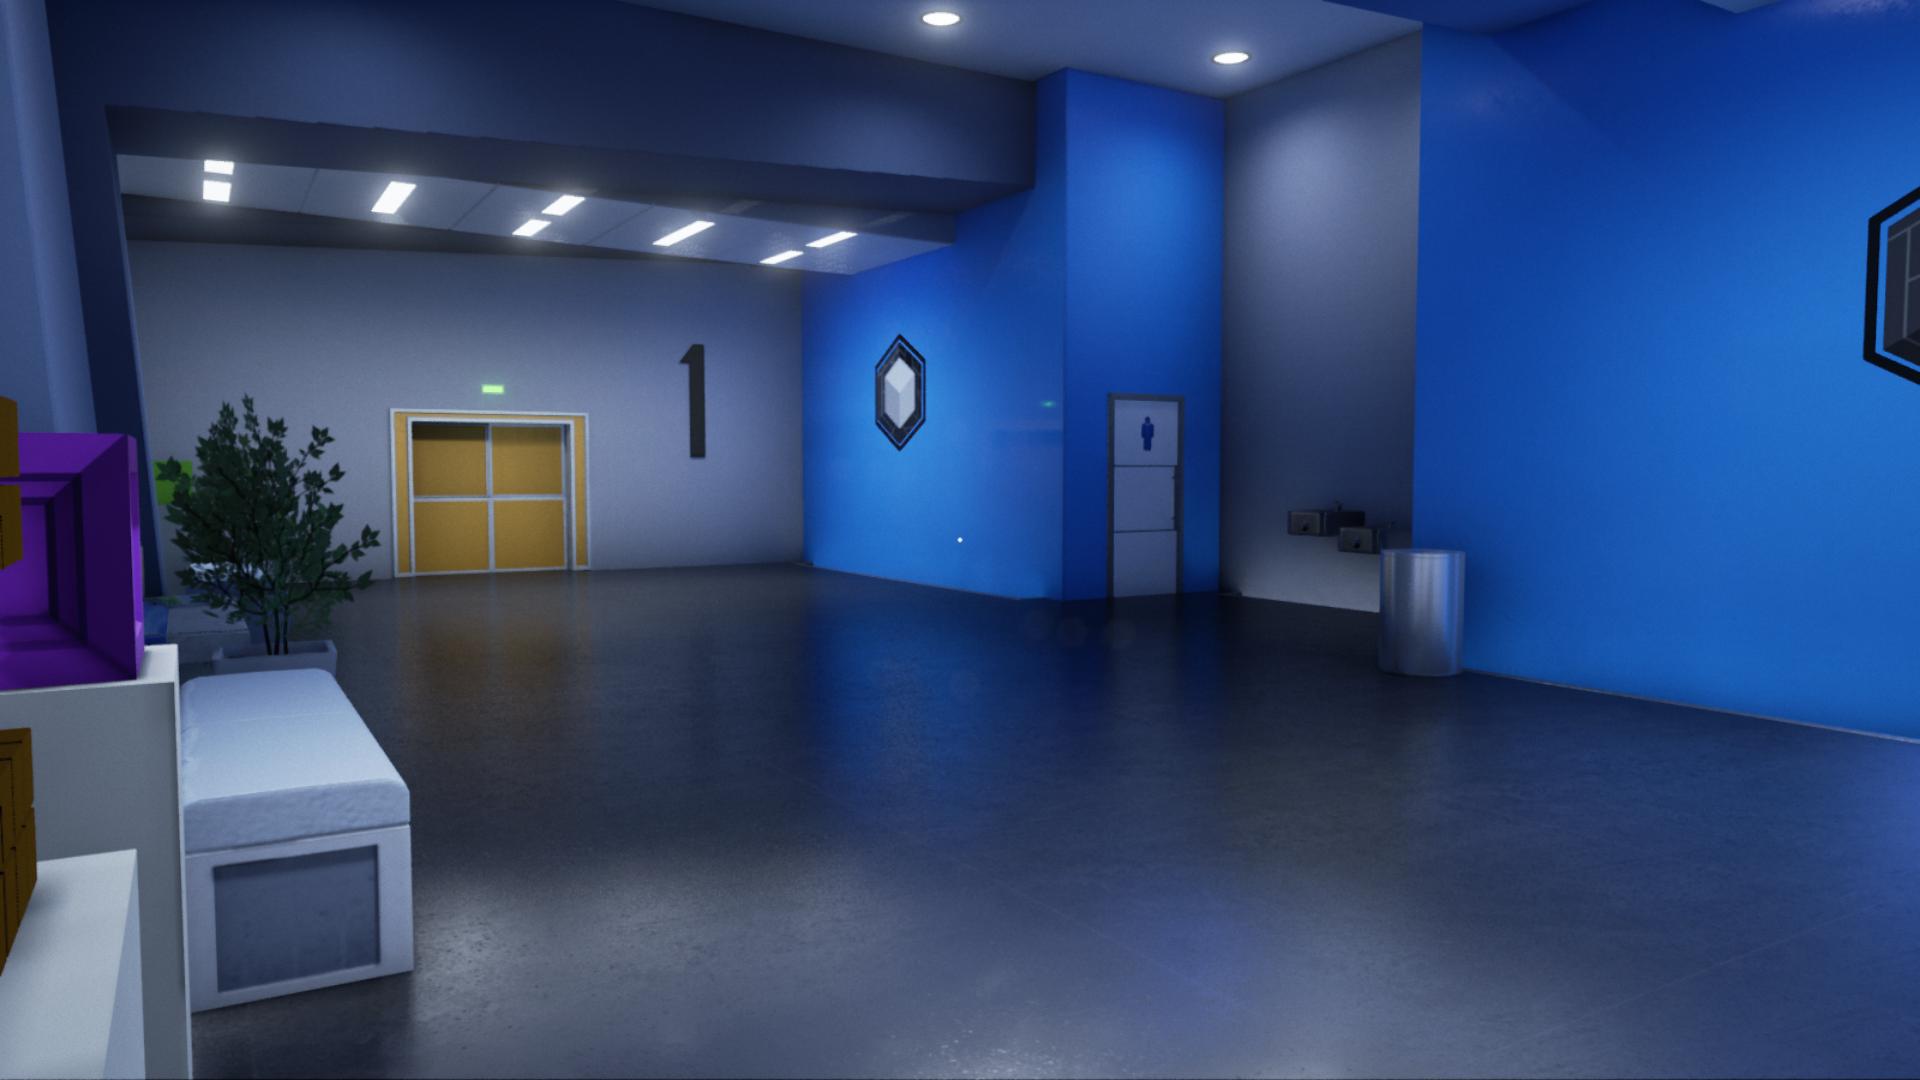 LVL1_Hallway_2_1